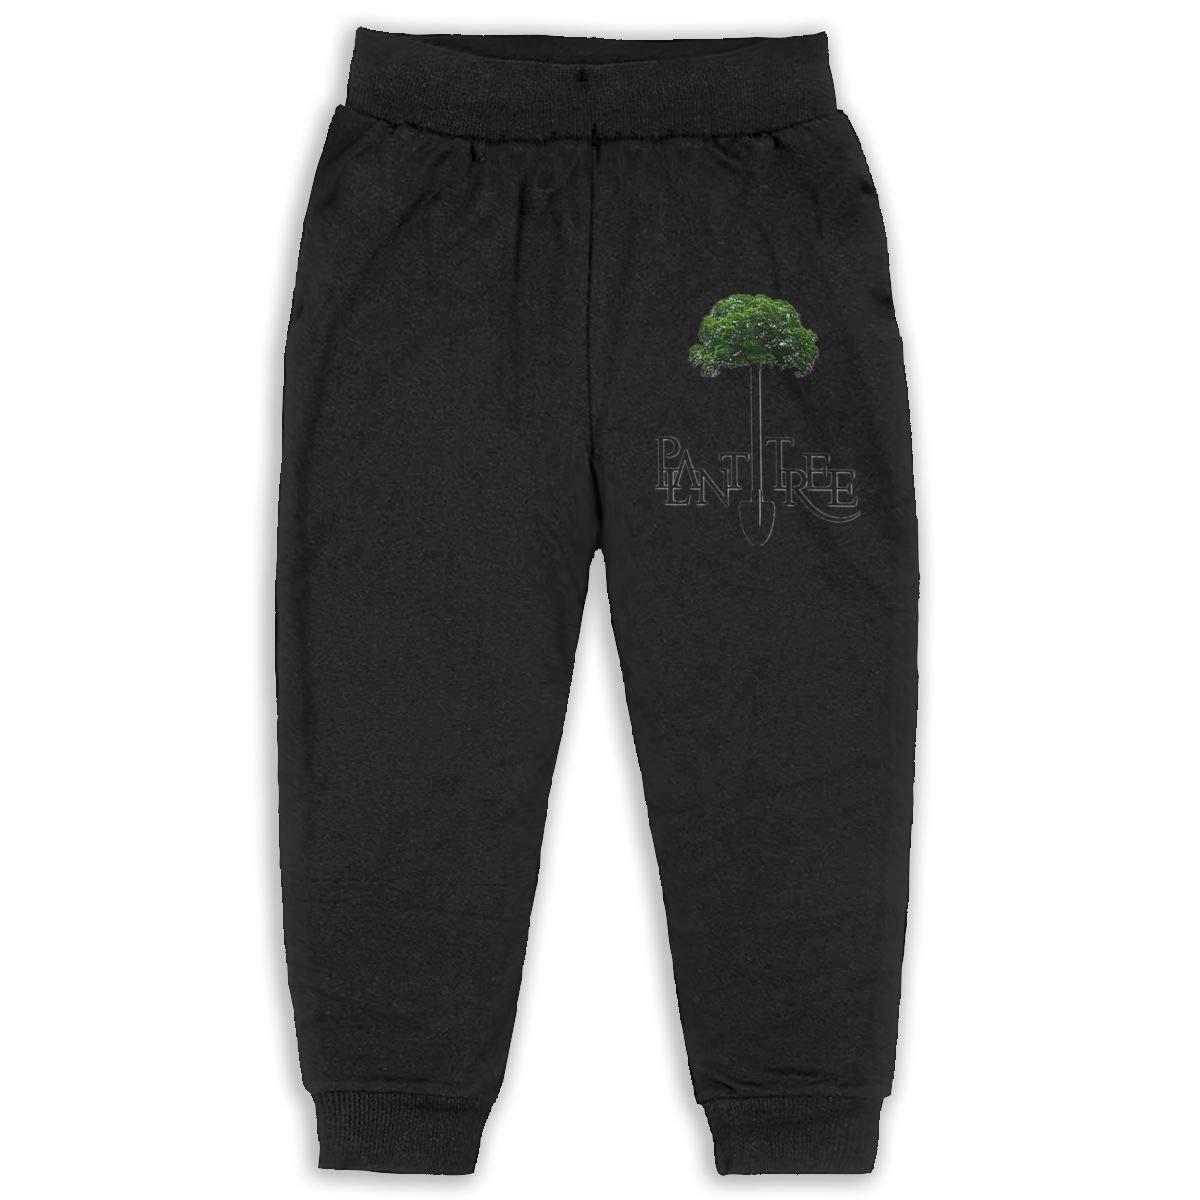 Plant Tree Icon Children Cartoon Cotton Sweatpants Sport Jogger Elastic Pants